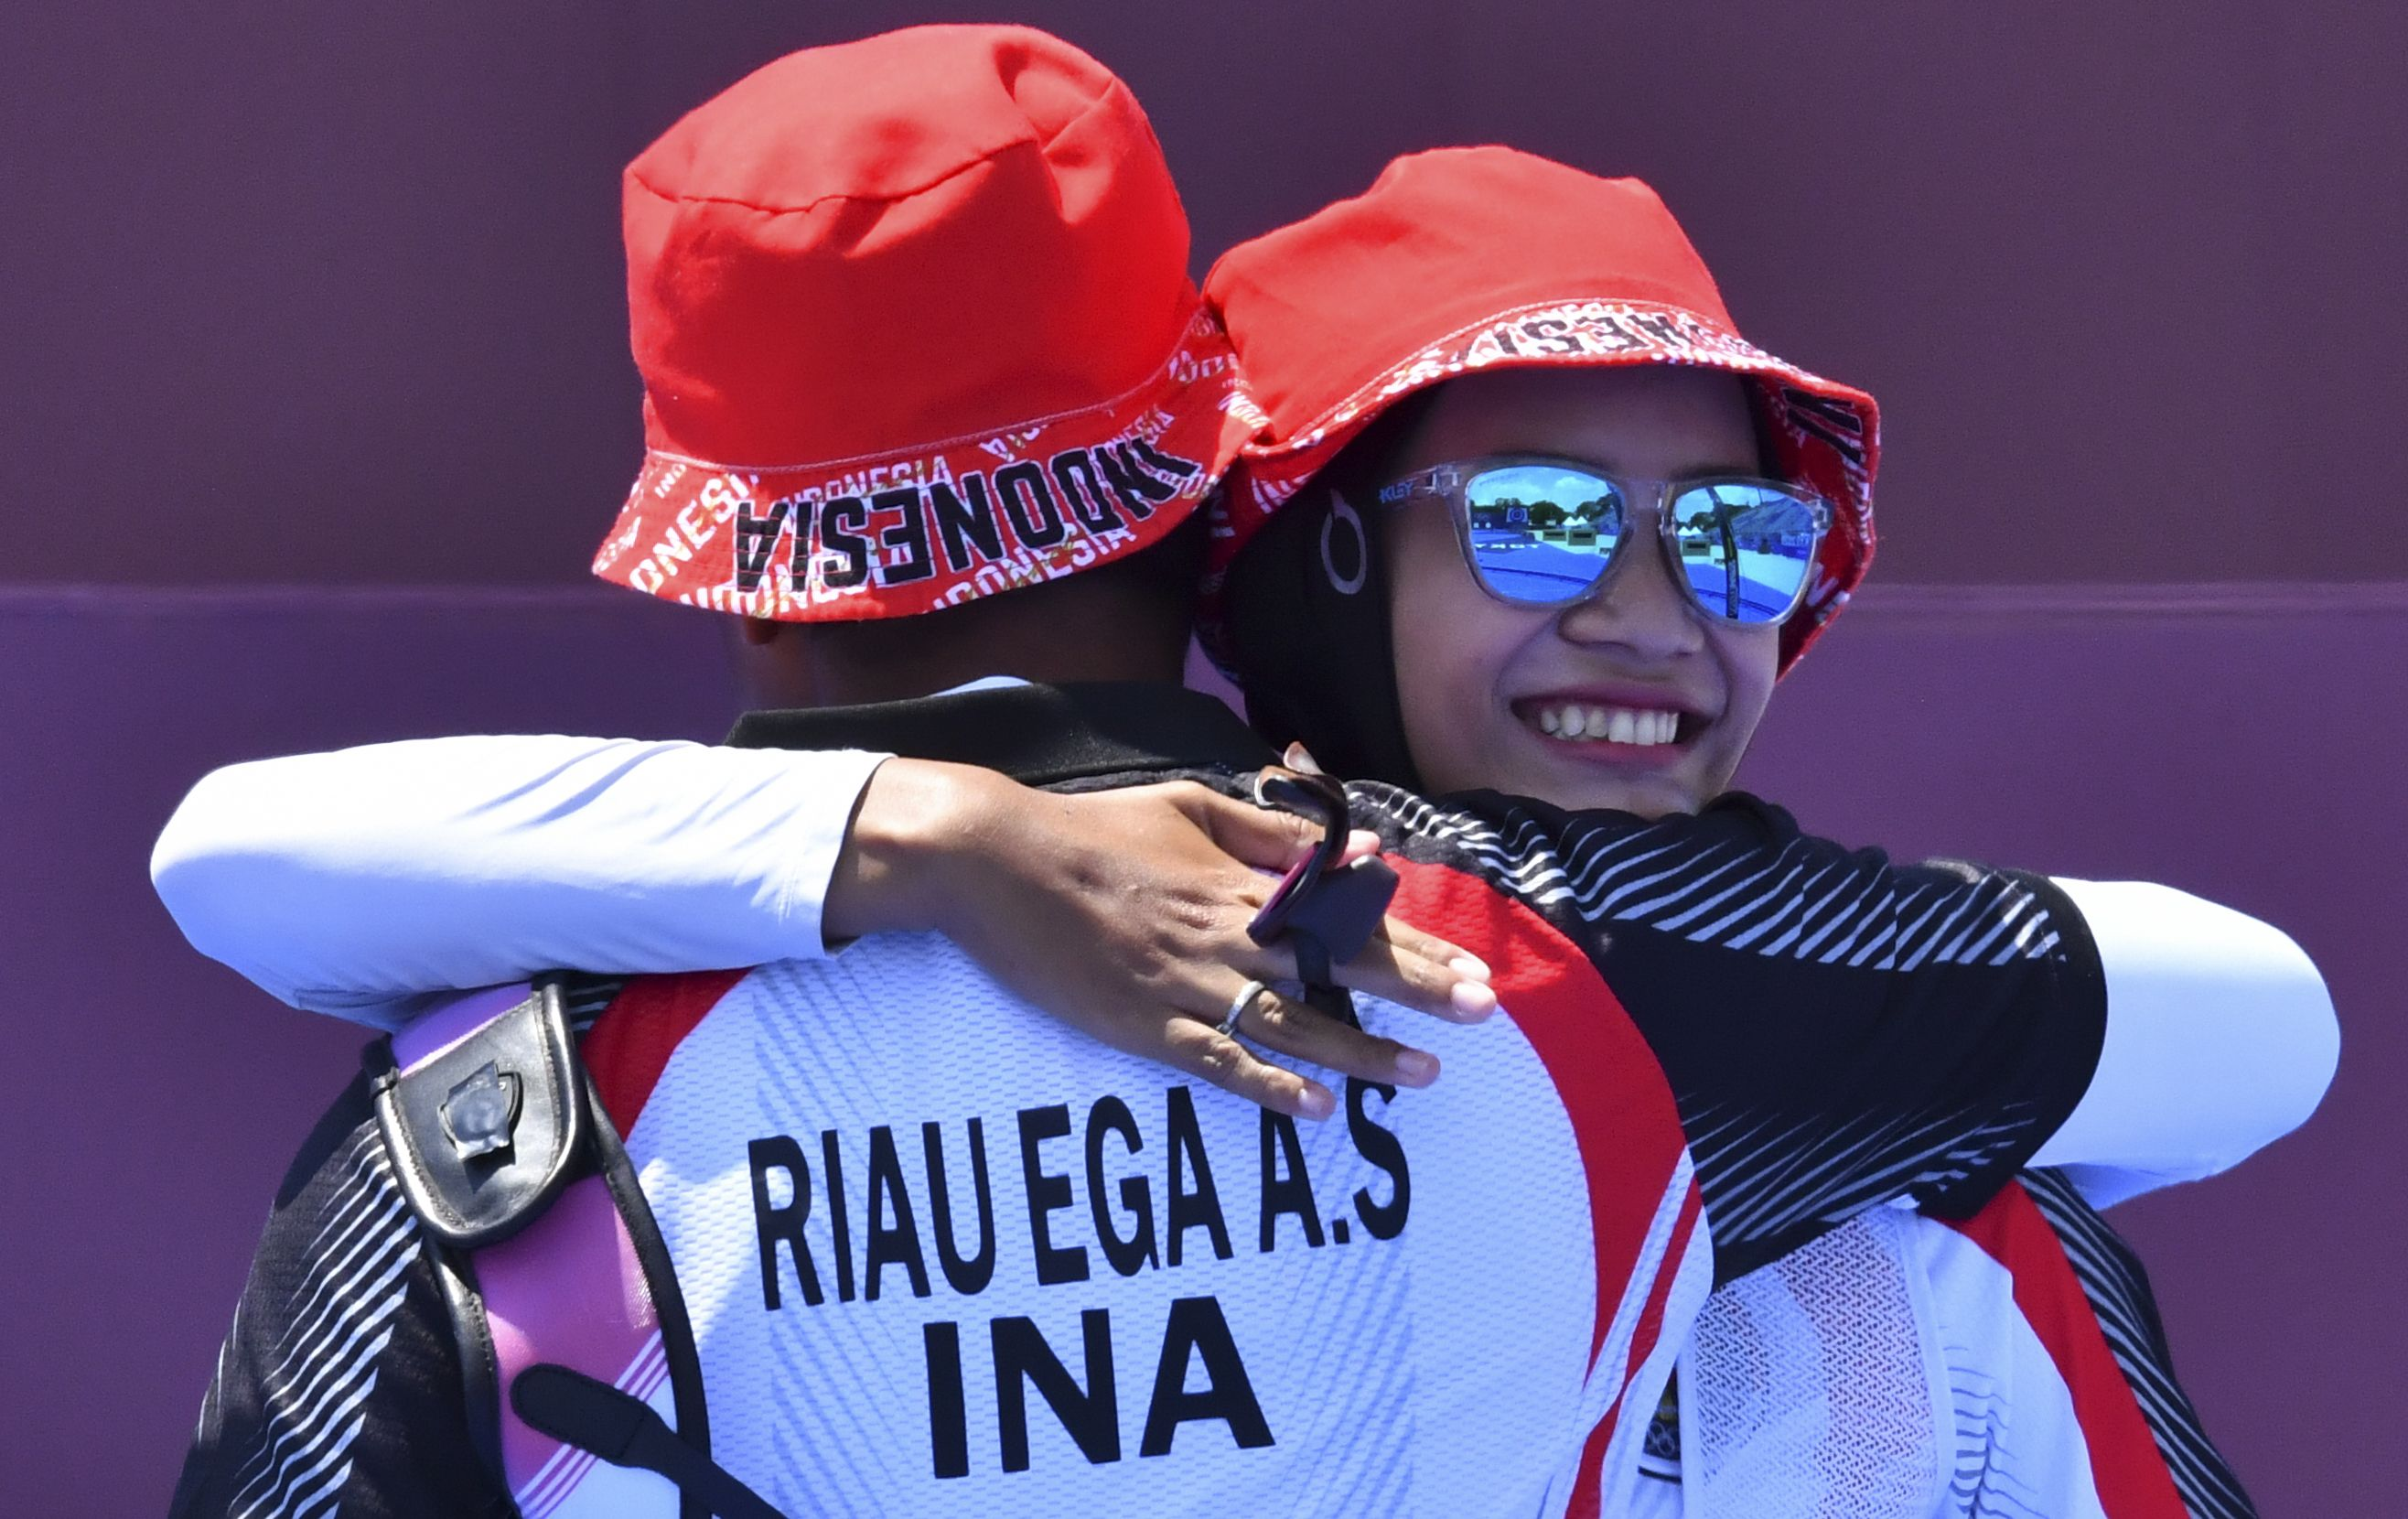 Tokyo 2020 Olympics - Archery - Mixed Team - 1/8 Finals - Yumenoshima Archery Field, Tokyo, Japan - July 24, 2021. Diananda Choirunisa of Indonesia and Agata Riau Ega Salsabilla of Indonesia react REUTERS/Clodagh Kilcoyne